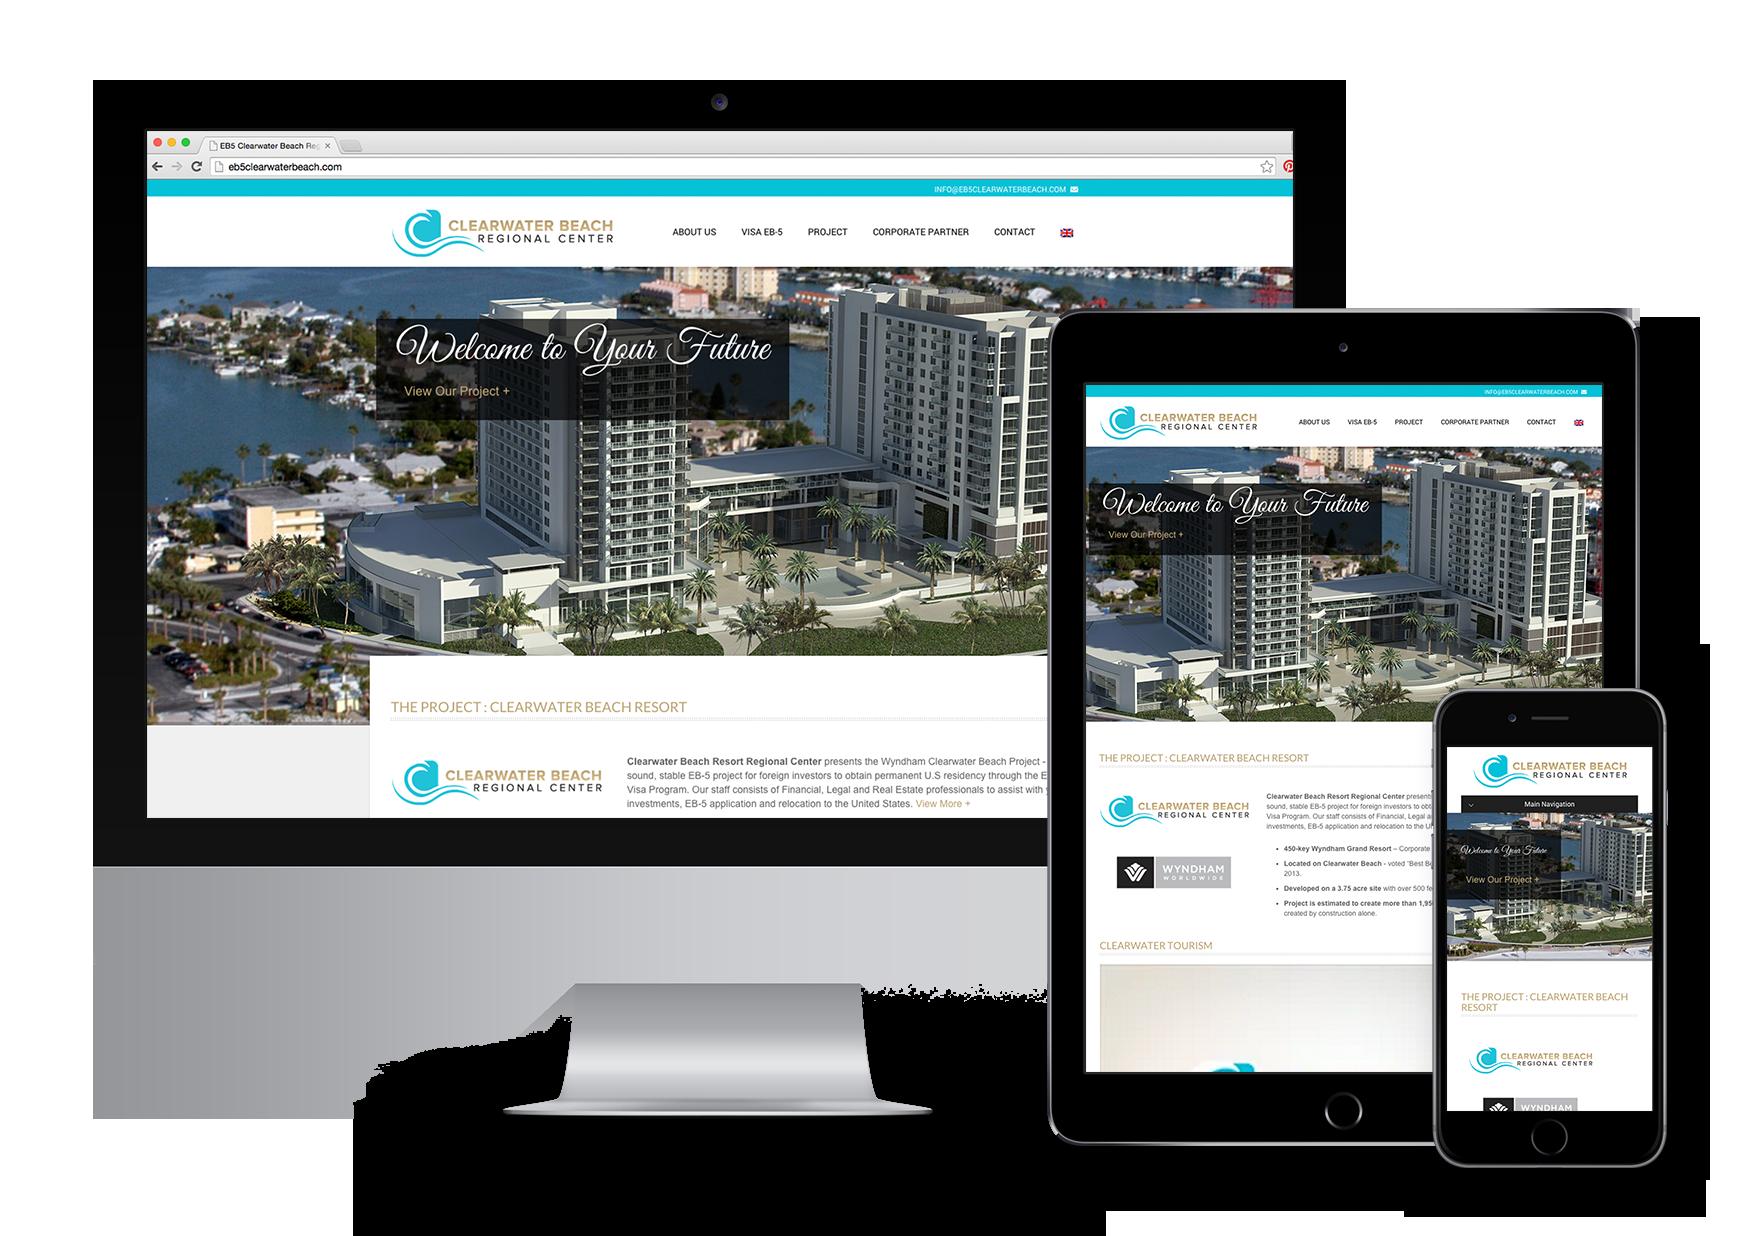 EB5 Clearwater Beach Regional Center Responsive Website Design